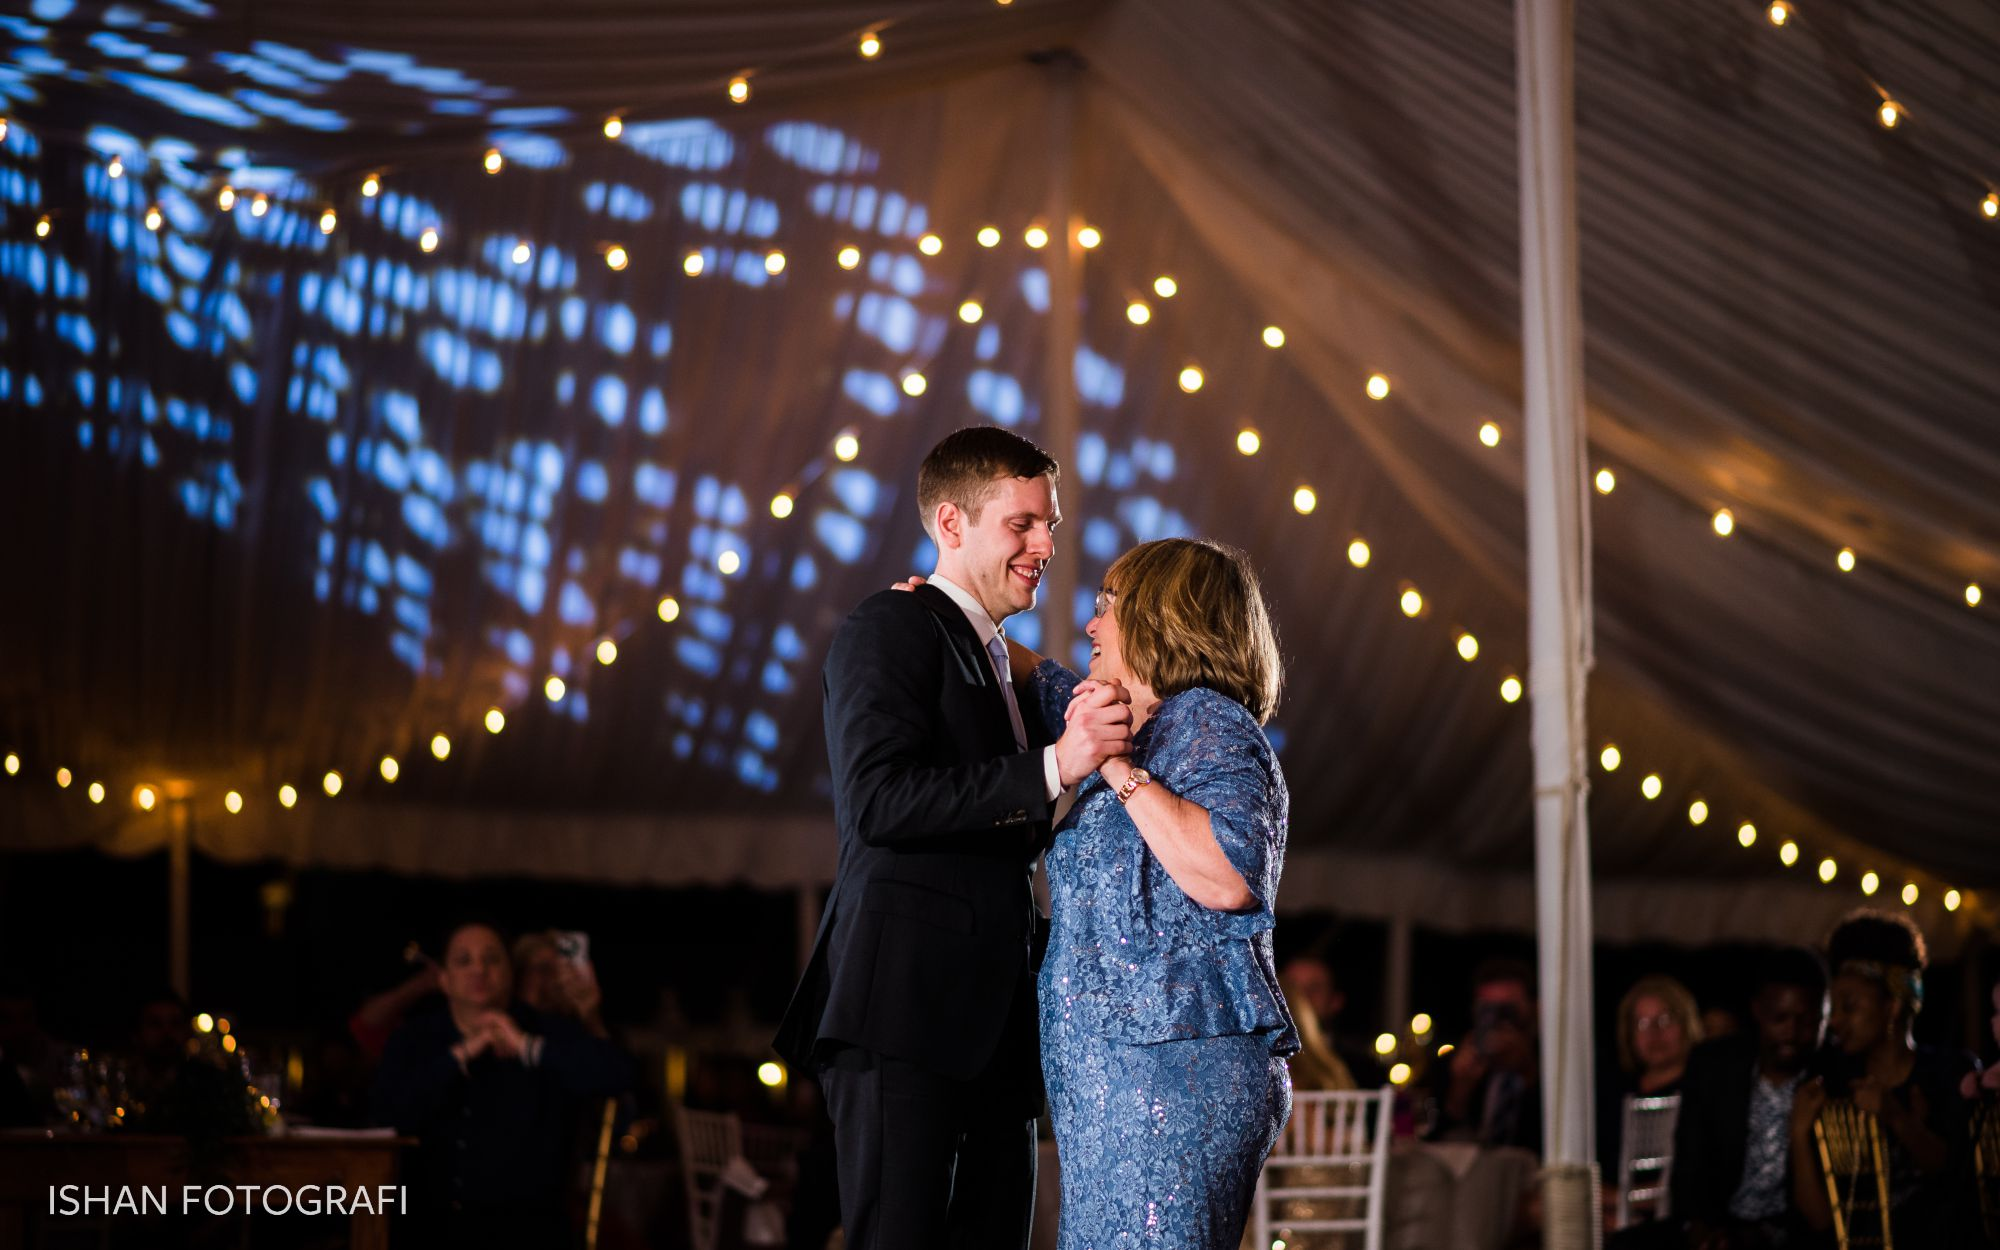 kent-manor-inn-wedding-reception